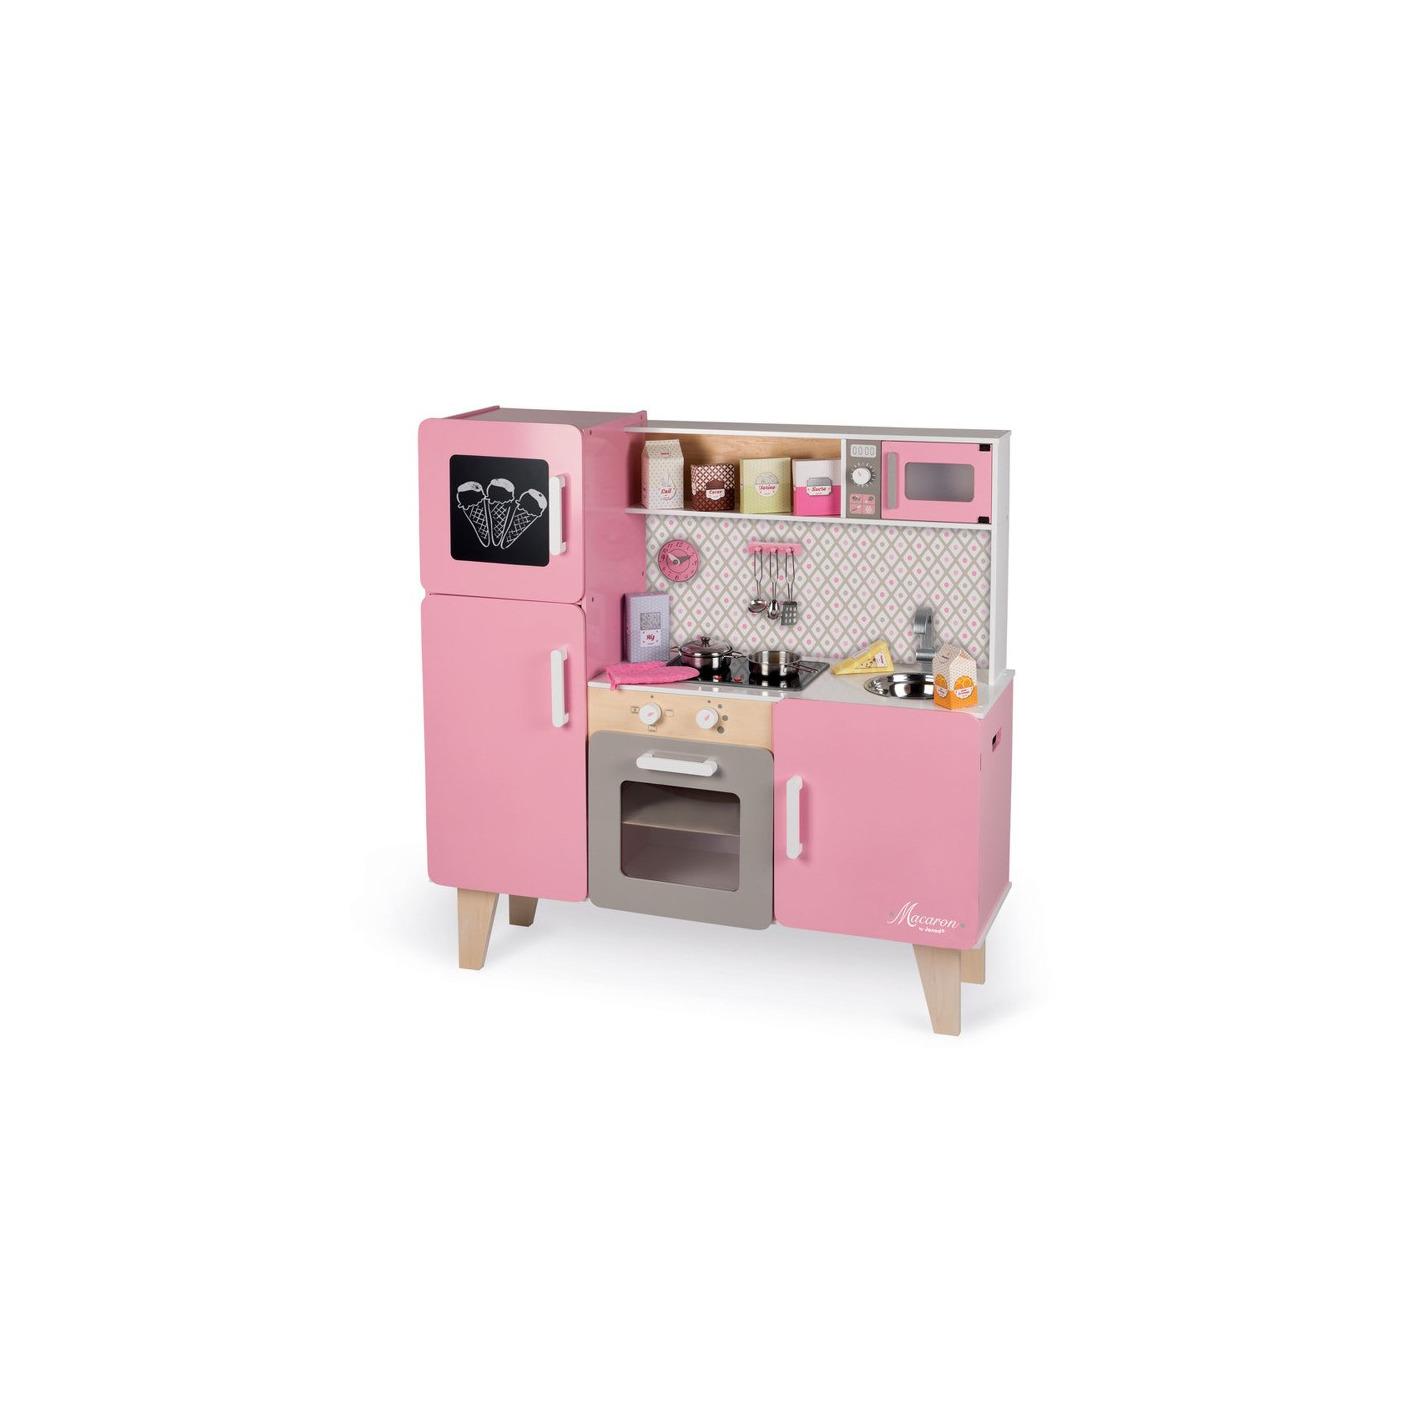 janod kuchnia drewniana xl z d wi kiem i 15 akcesoriami macaron. Black Bedroom Furniture Sets. Home Design Ideas